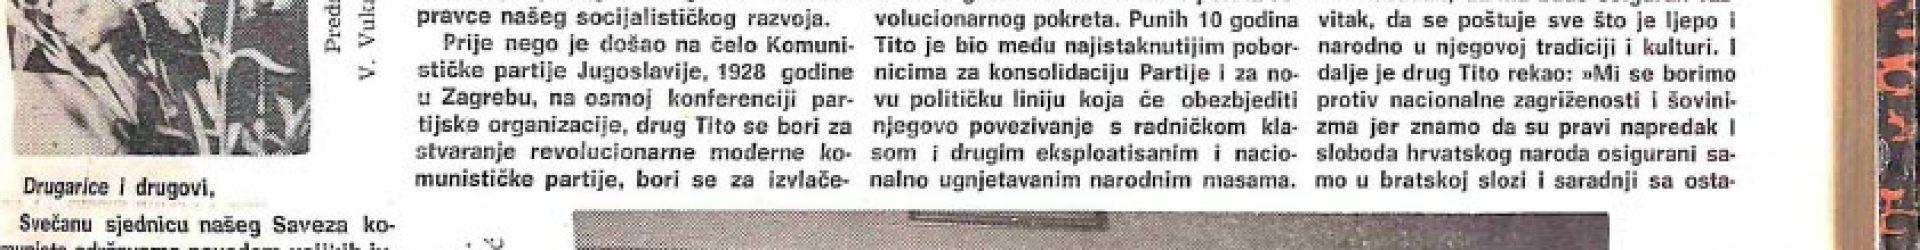 25 studeni 1977